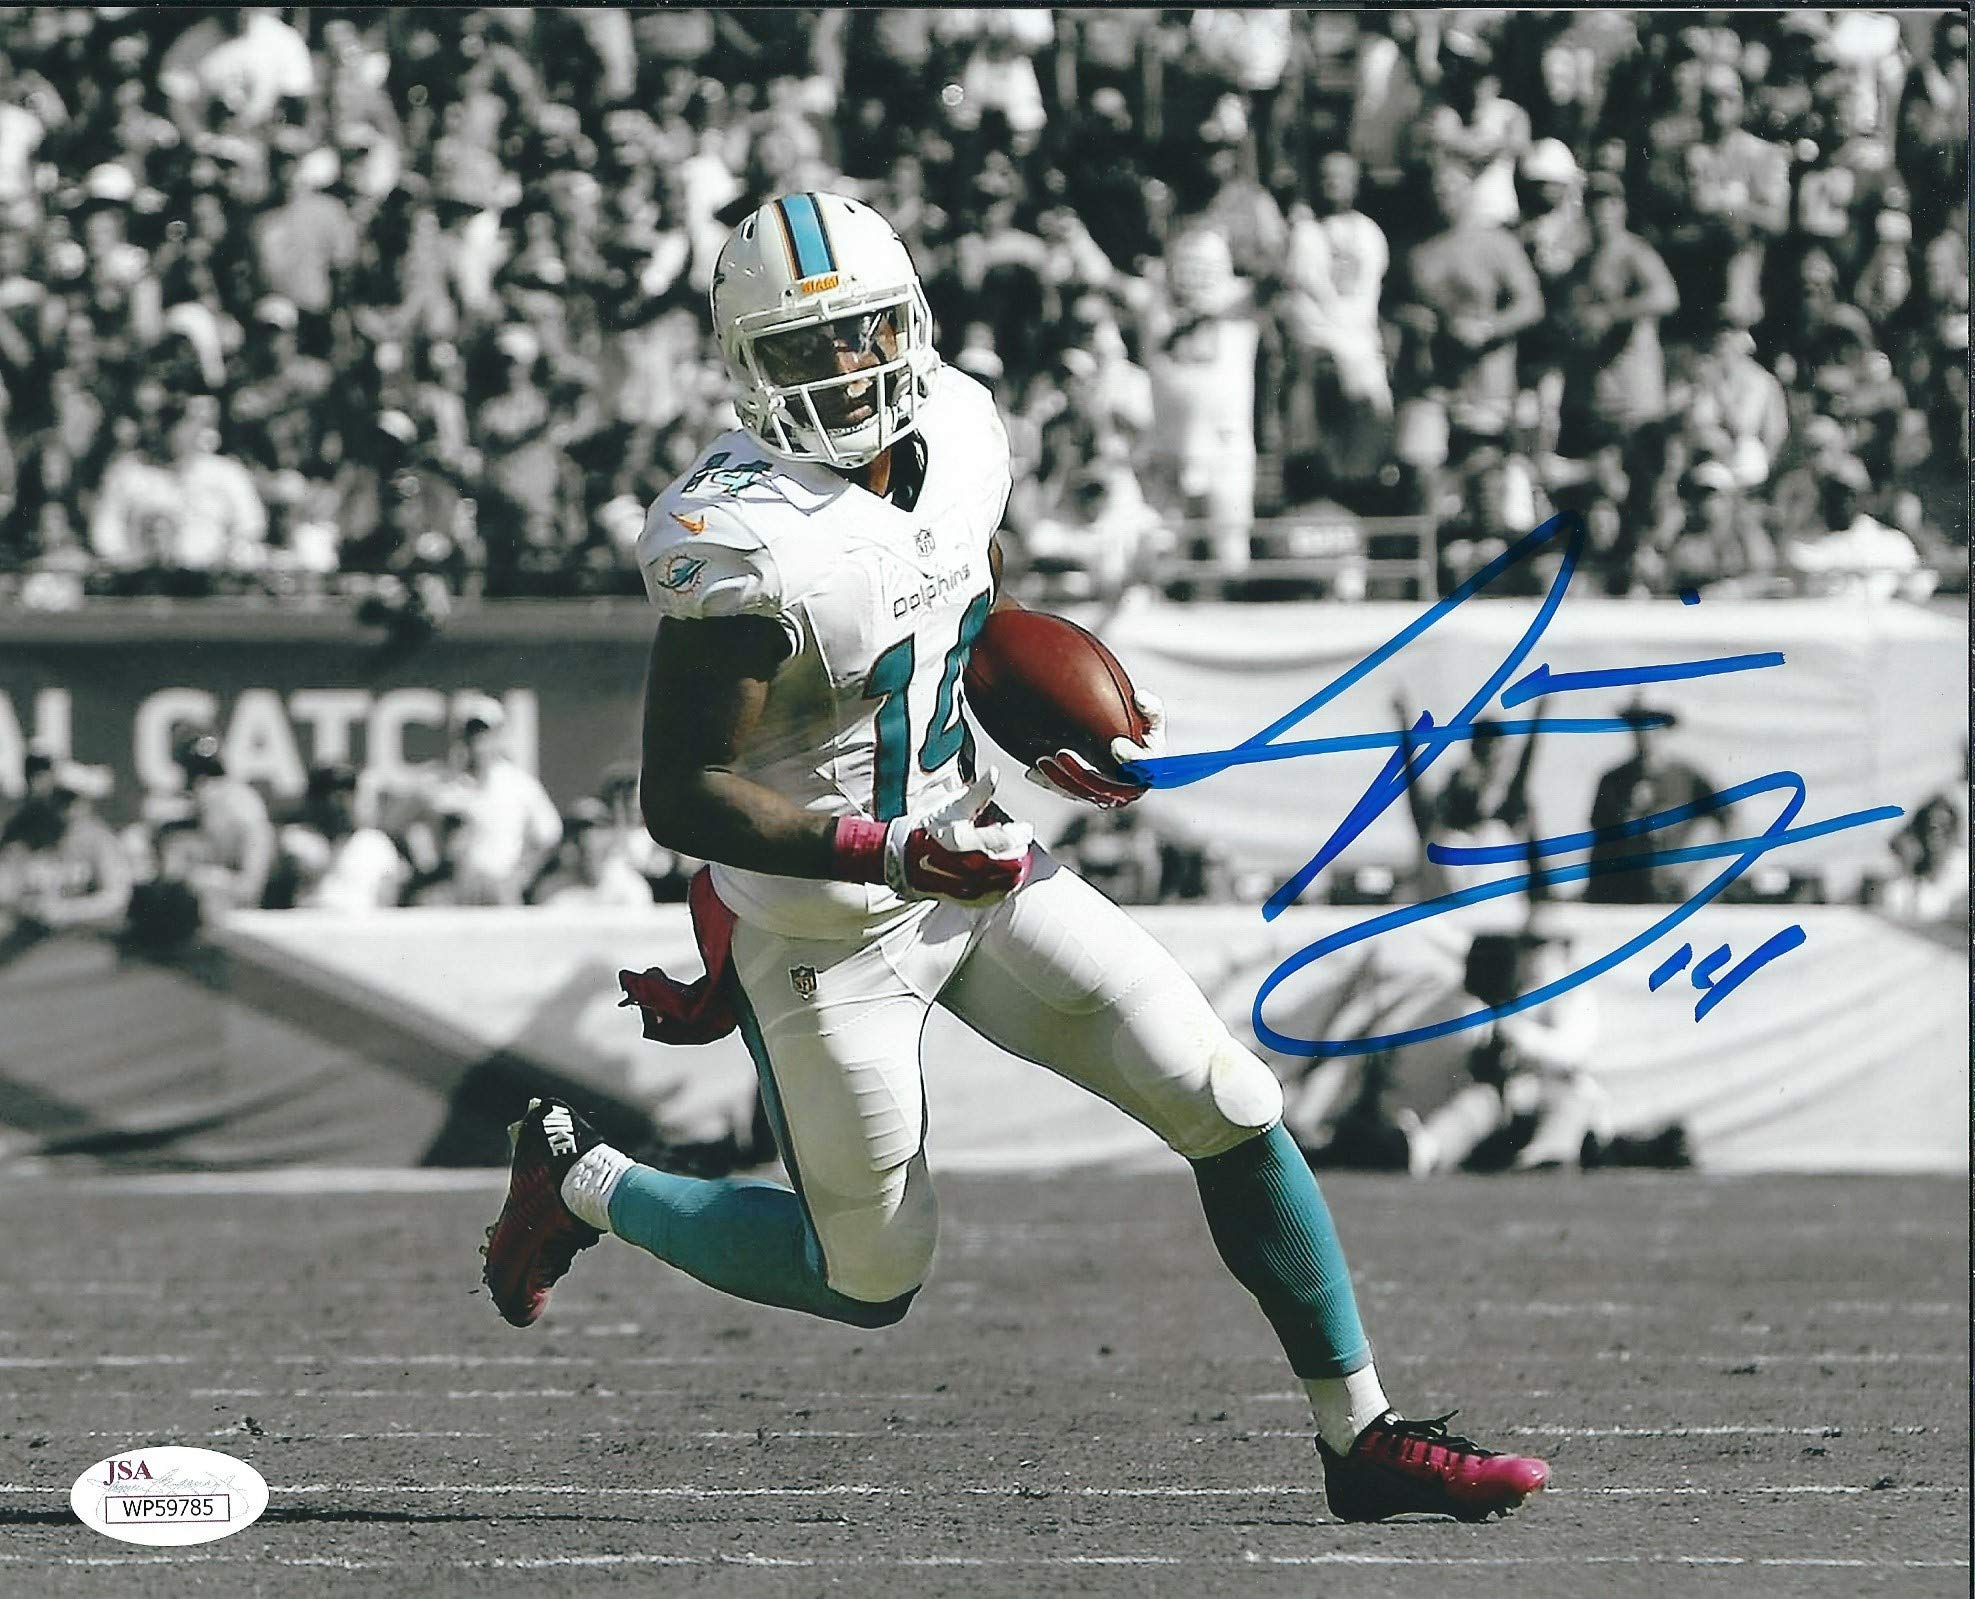 Autographed Jarvis Landry 8x10 Miami Dolphins Photo JSA